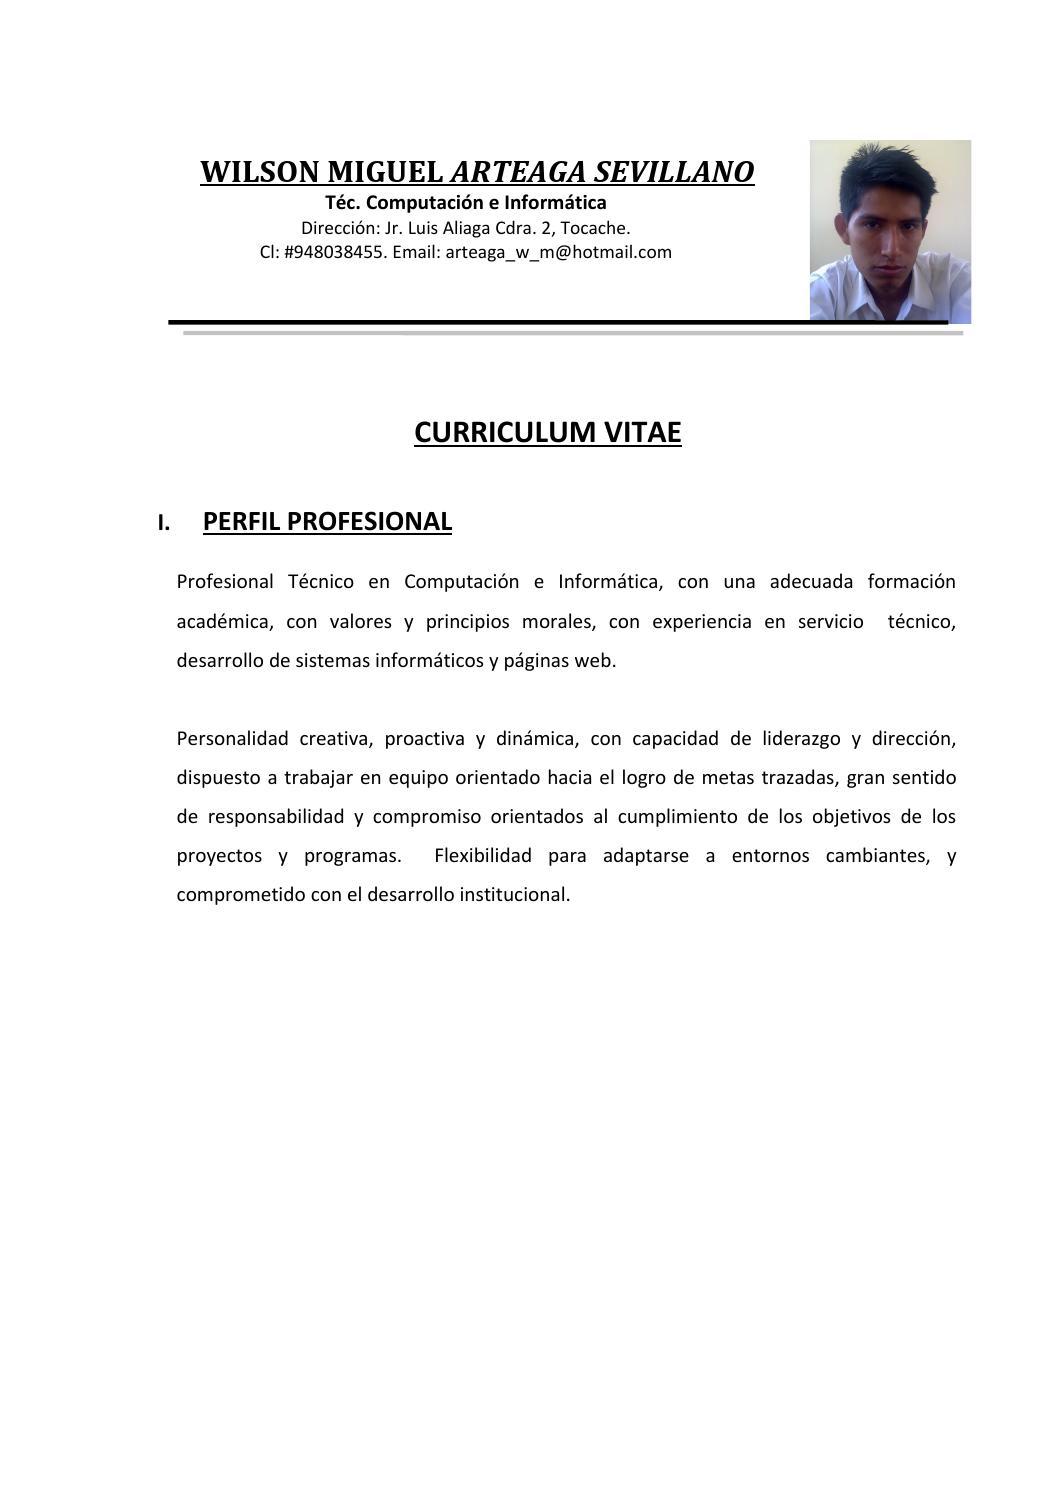 Fantástico Objetivo De Curriculum Vitae Desarrollador Web Fotos ...